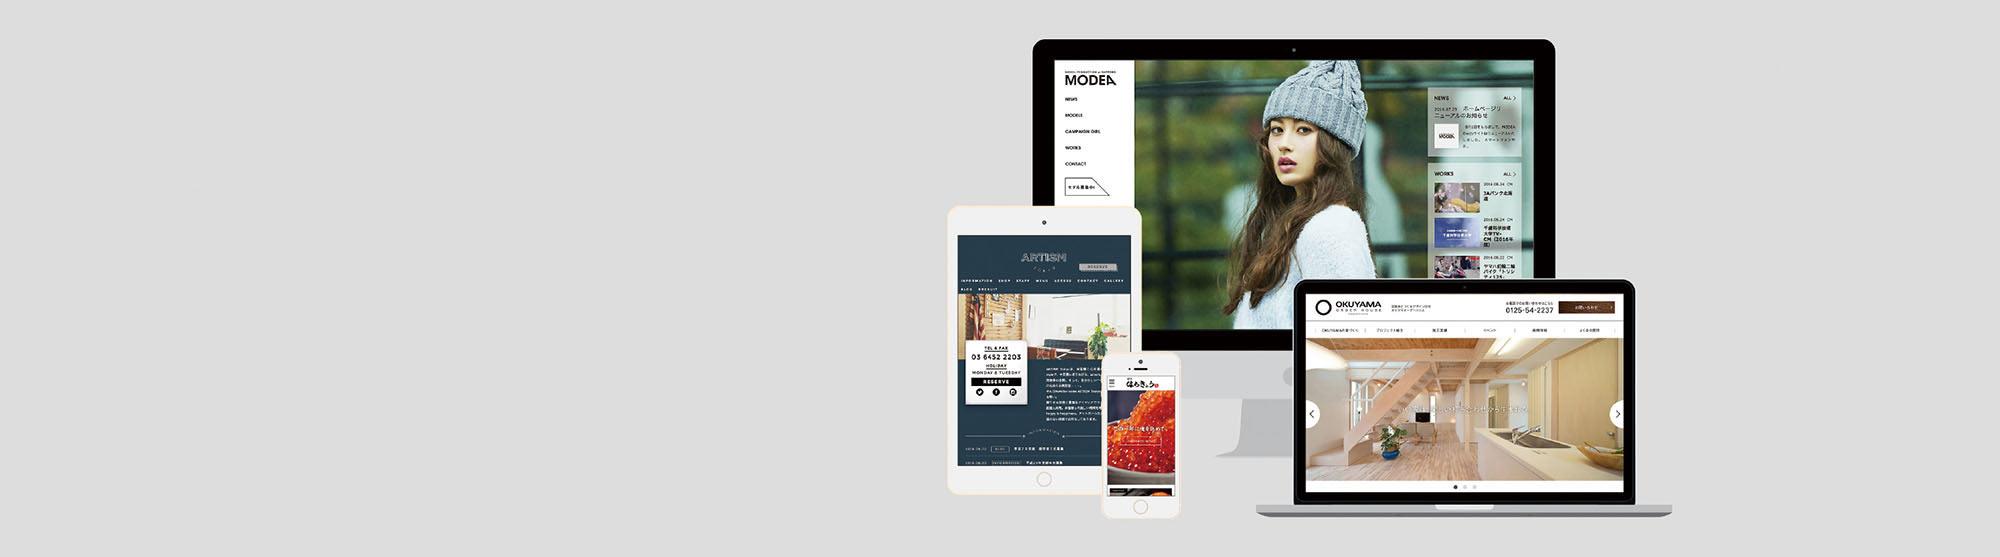 PARTNER DESIGN-HOMEPAGE 初期費用無料のホームページ制作